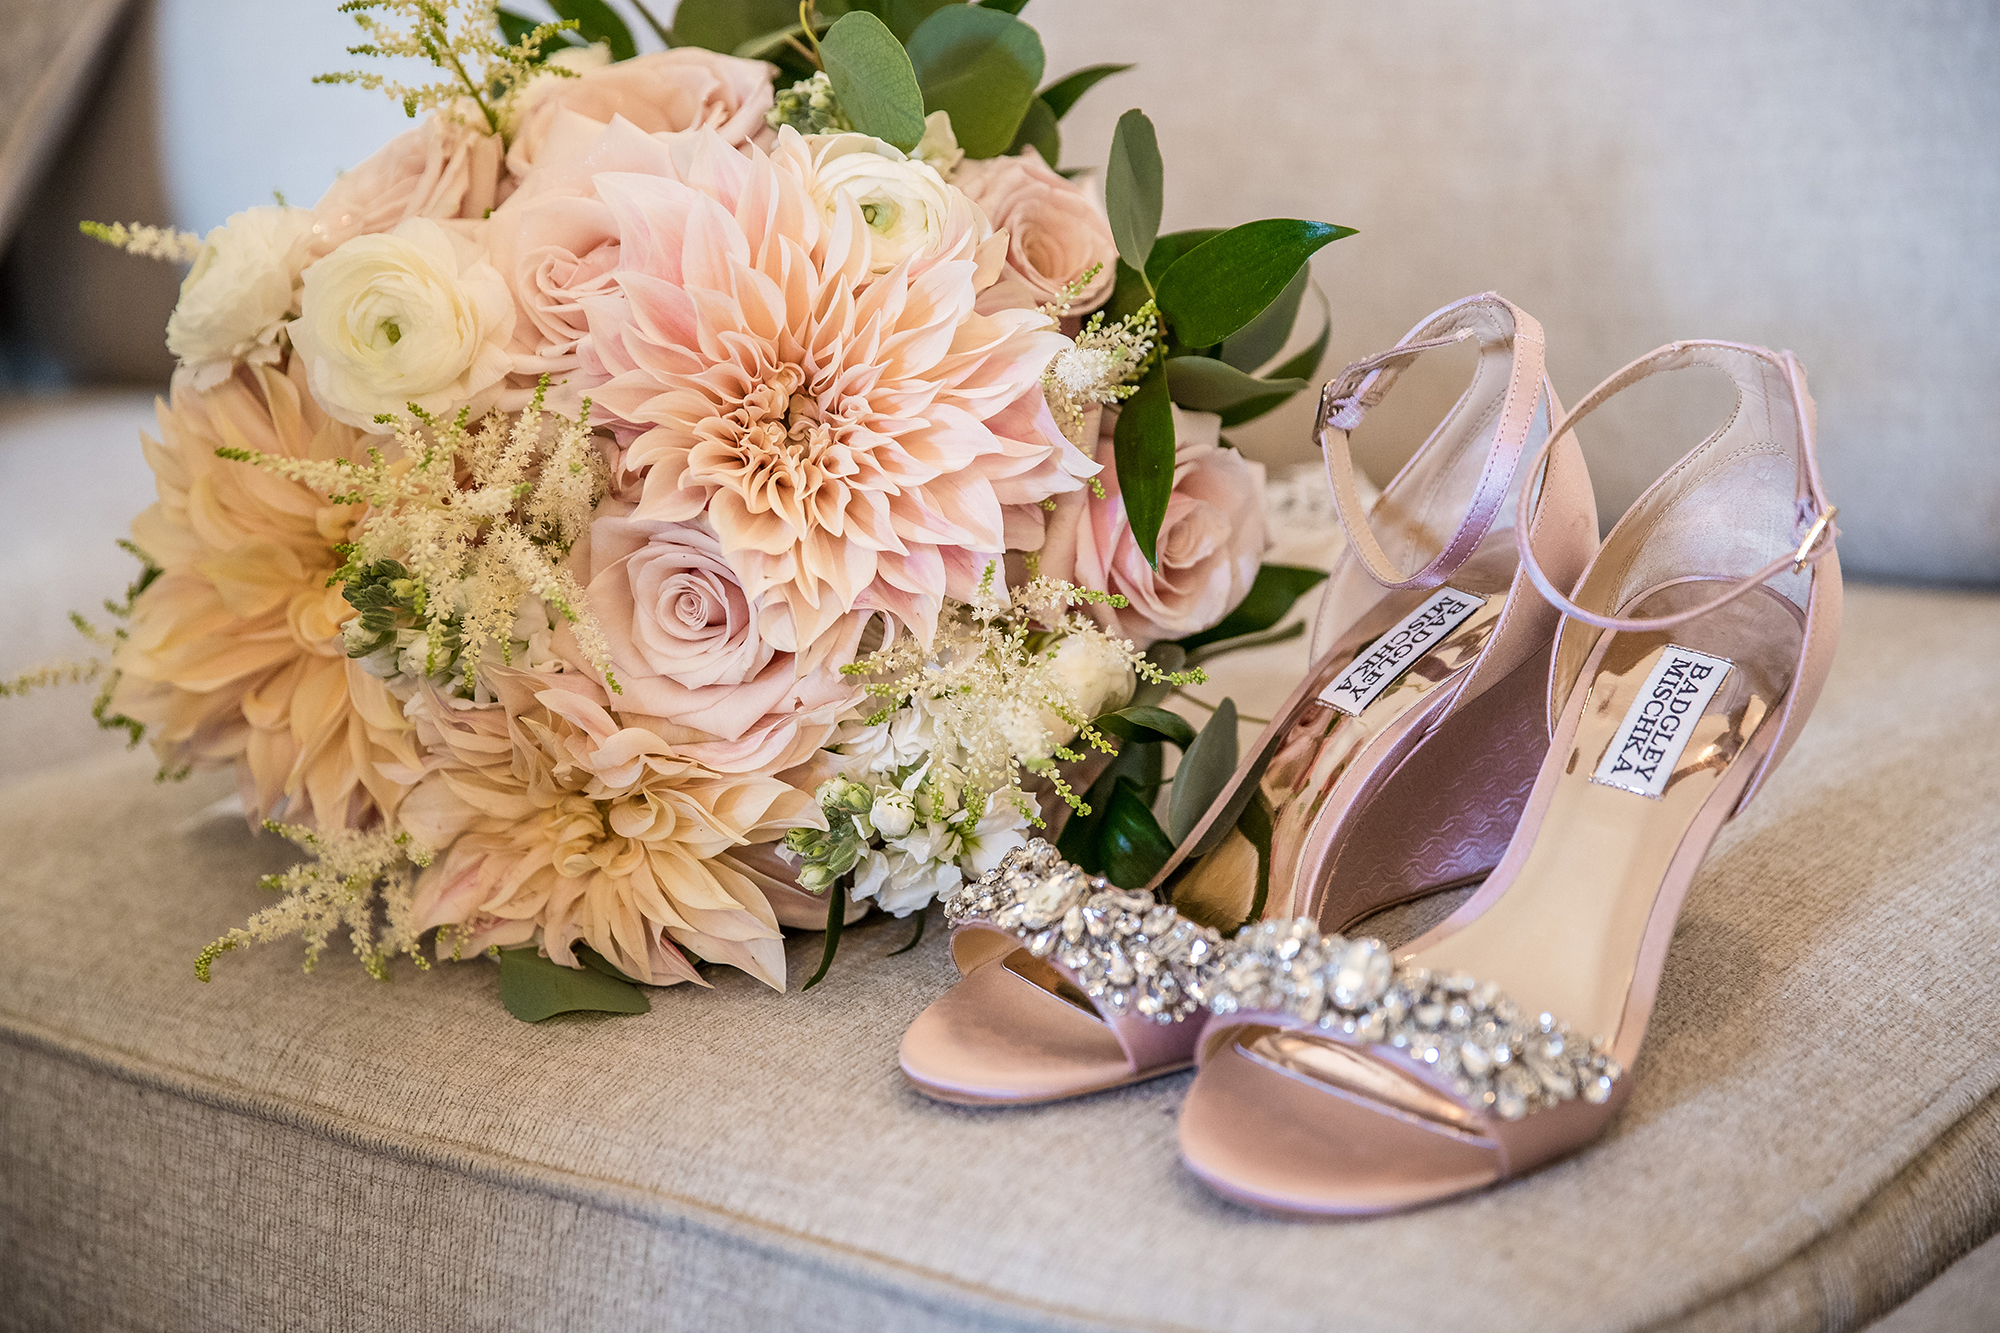 lbi-photographer-ac-wedding-claridge-val-7.jpg